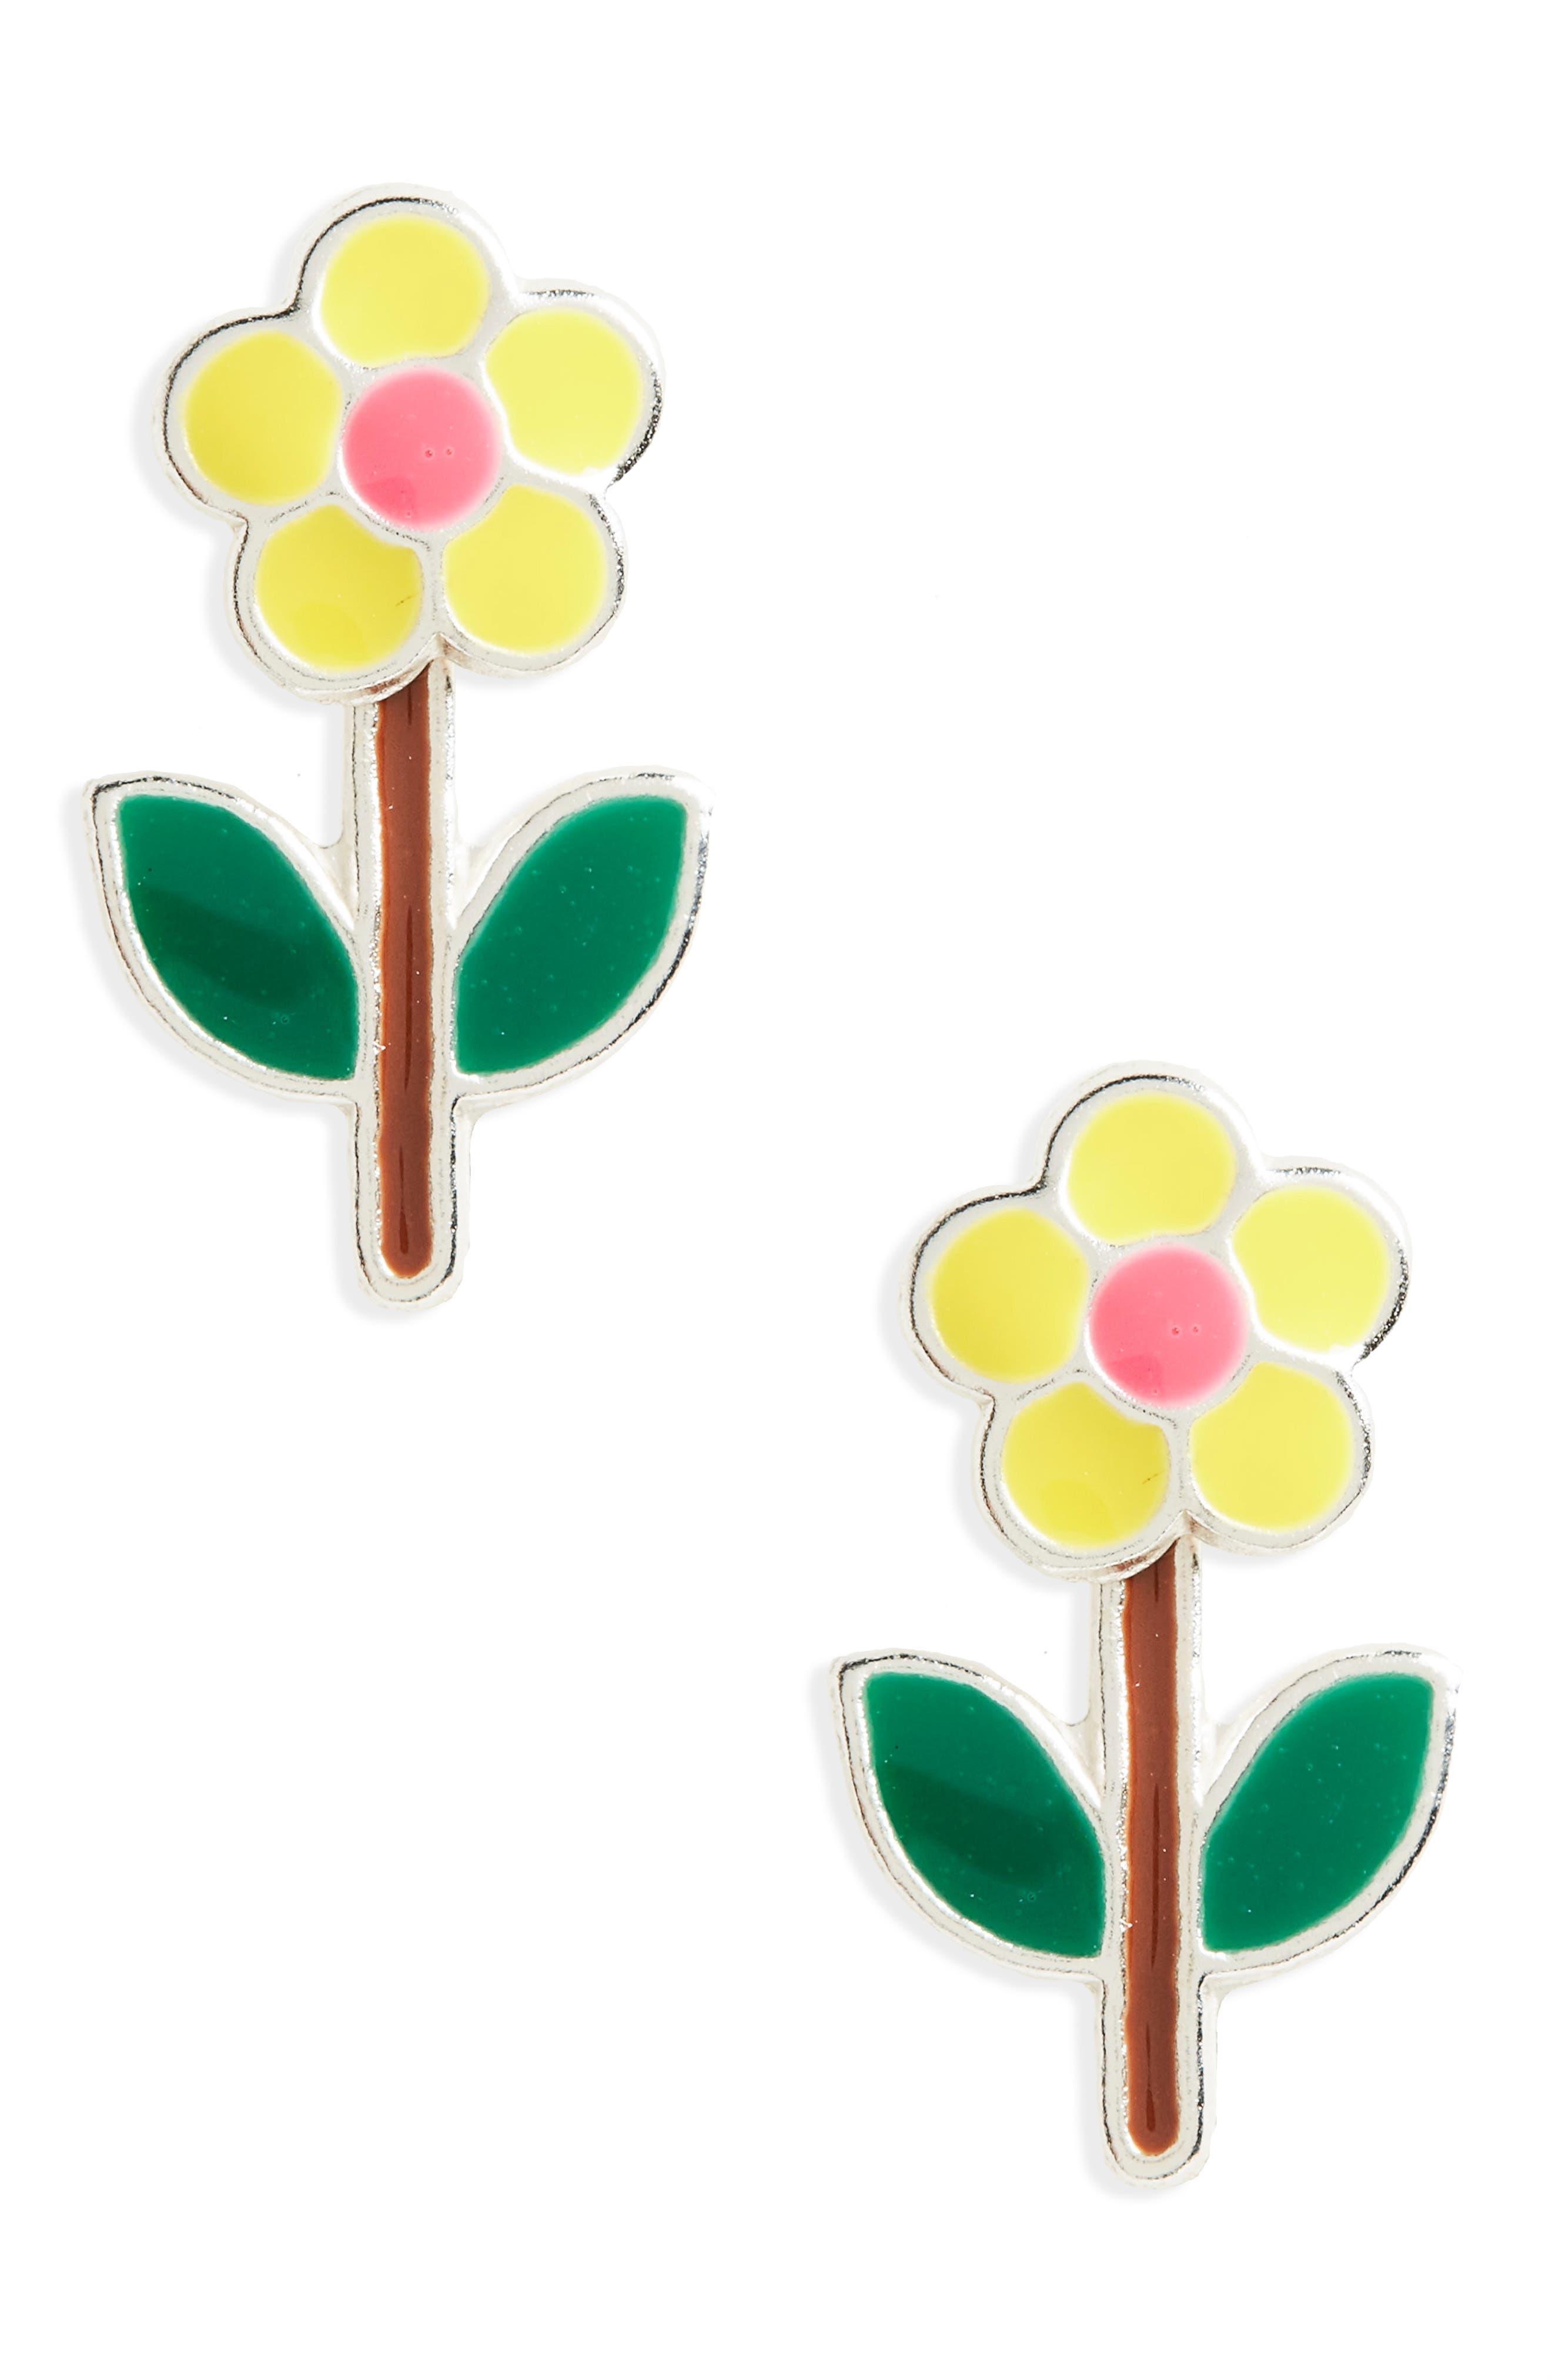 Flower Sterling Silver Stud Earrings,                             Main thumbnail 1, color,